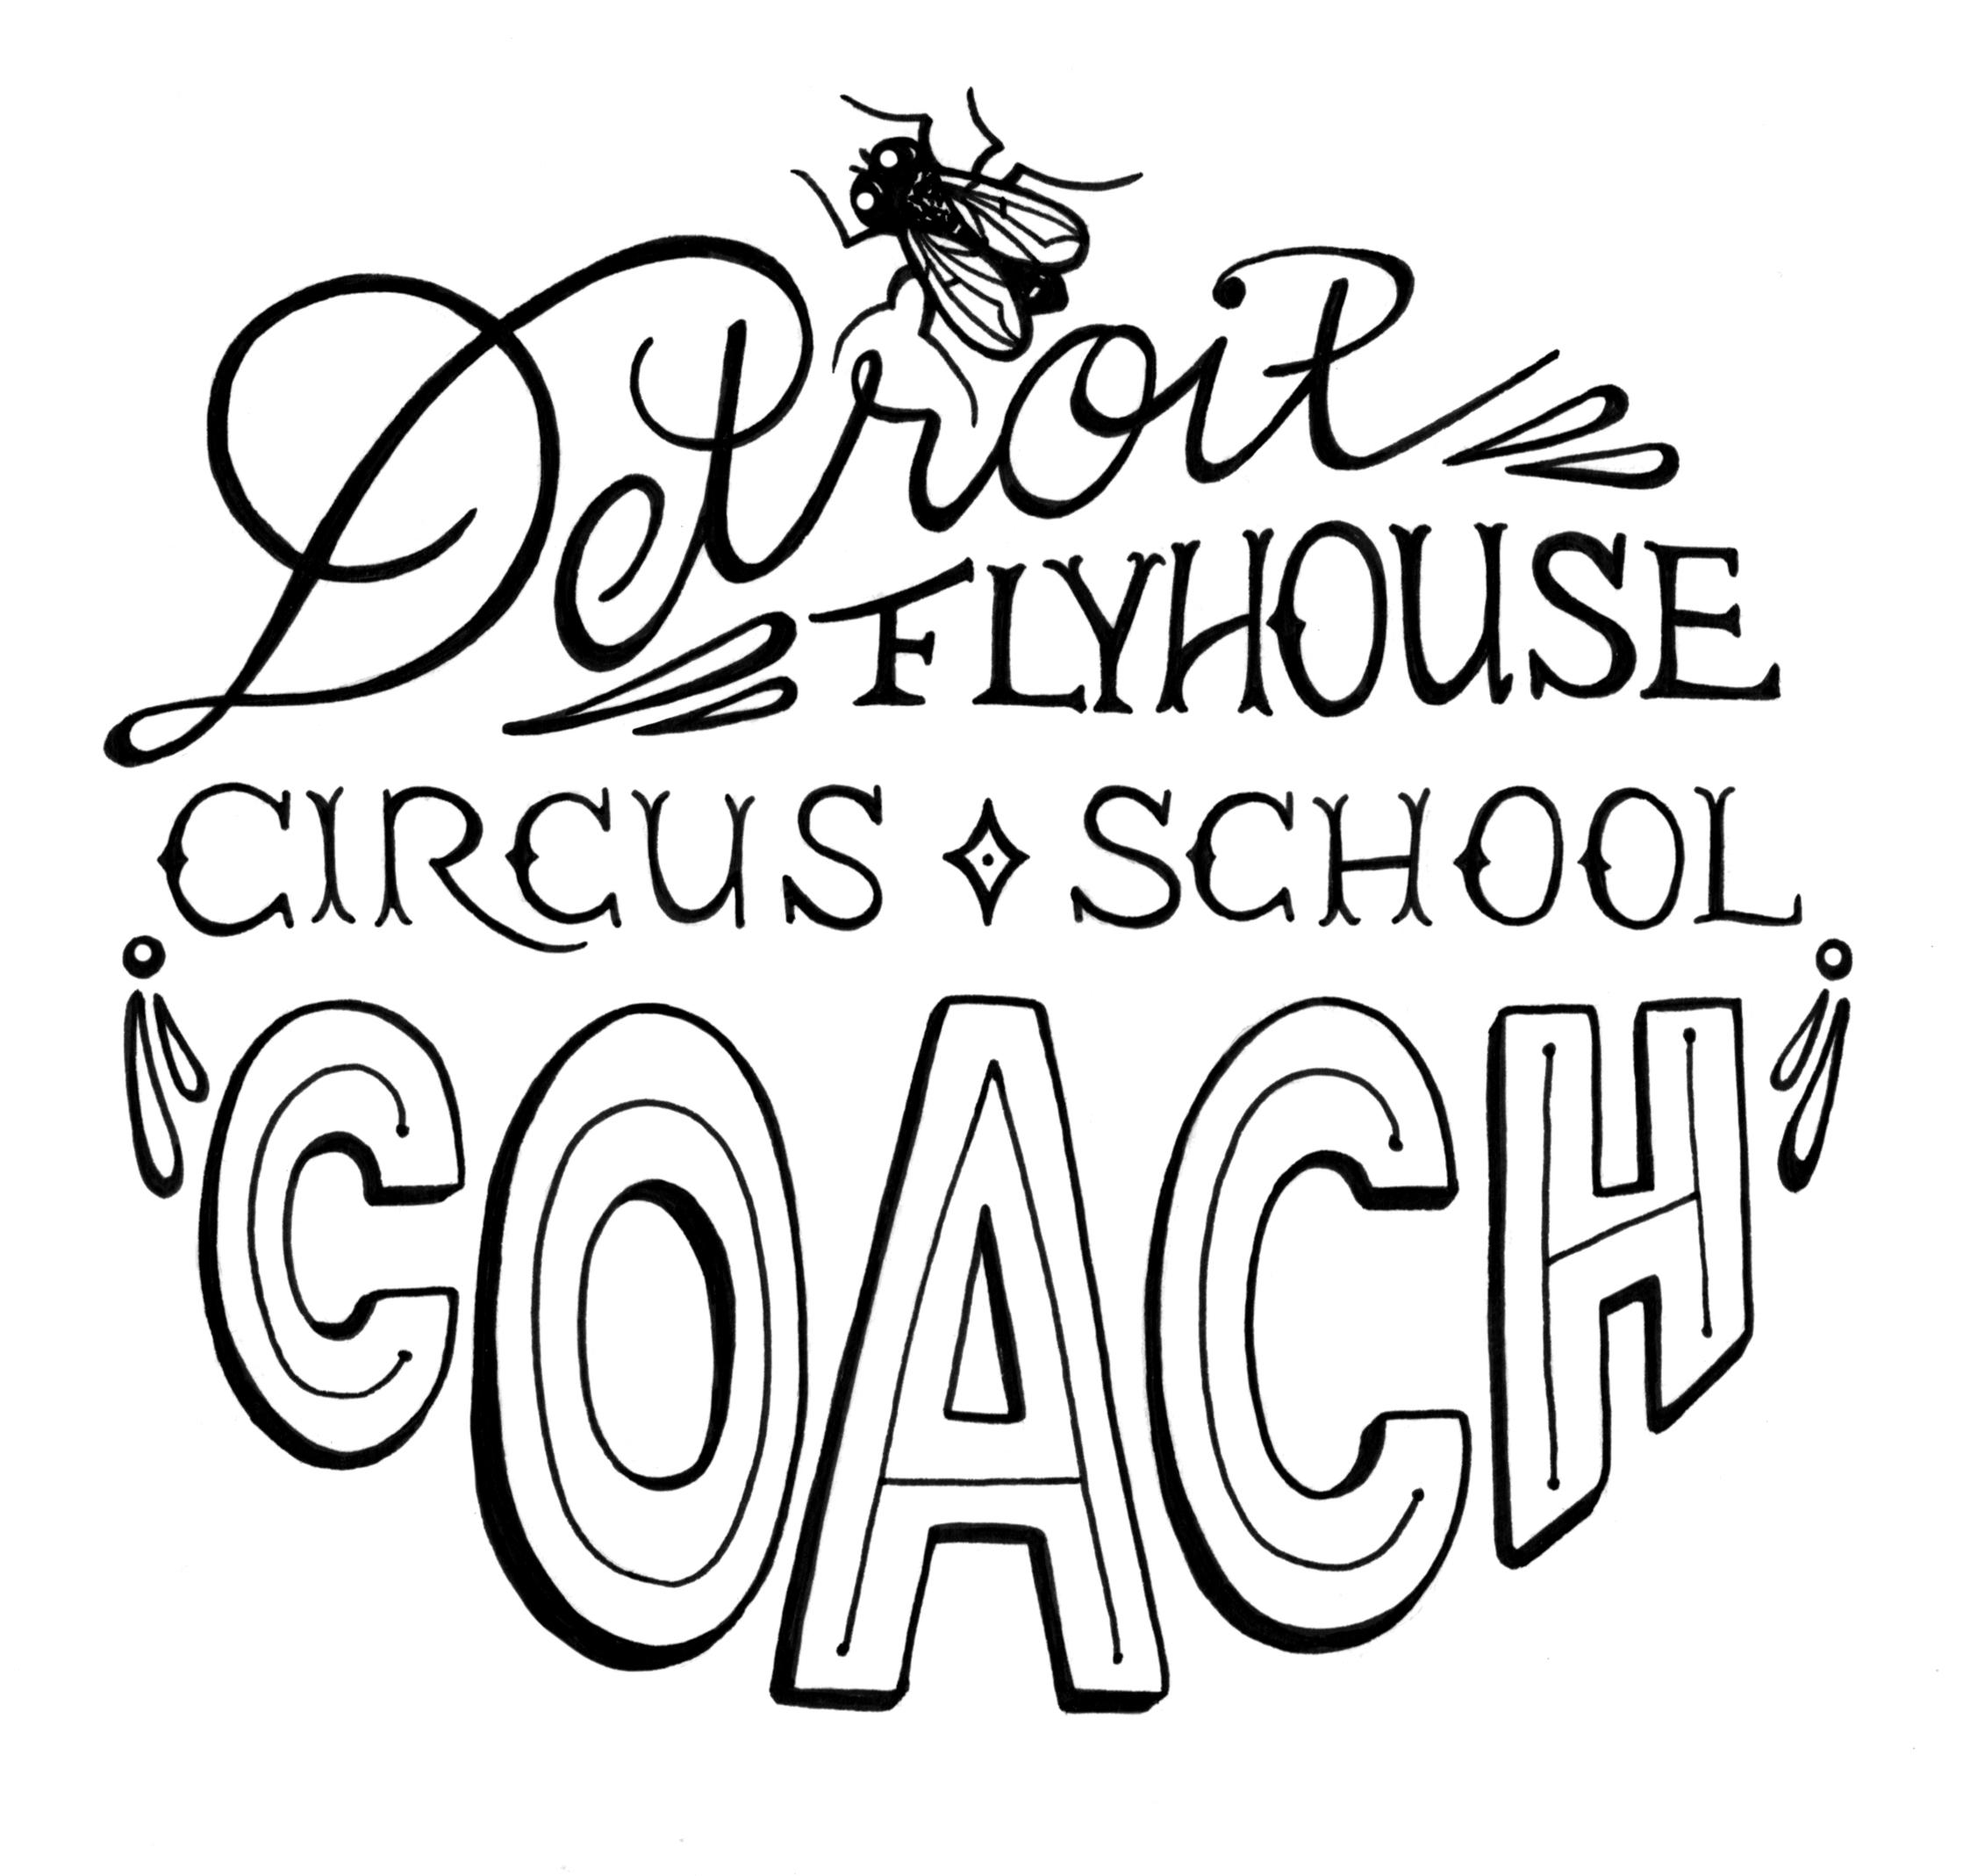 Detroit Flyhouse Coach.jpg